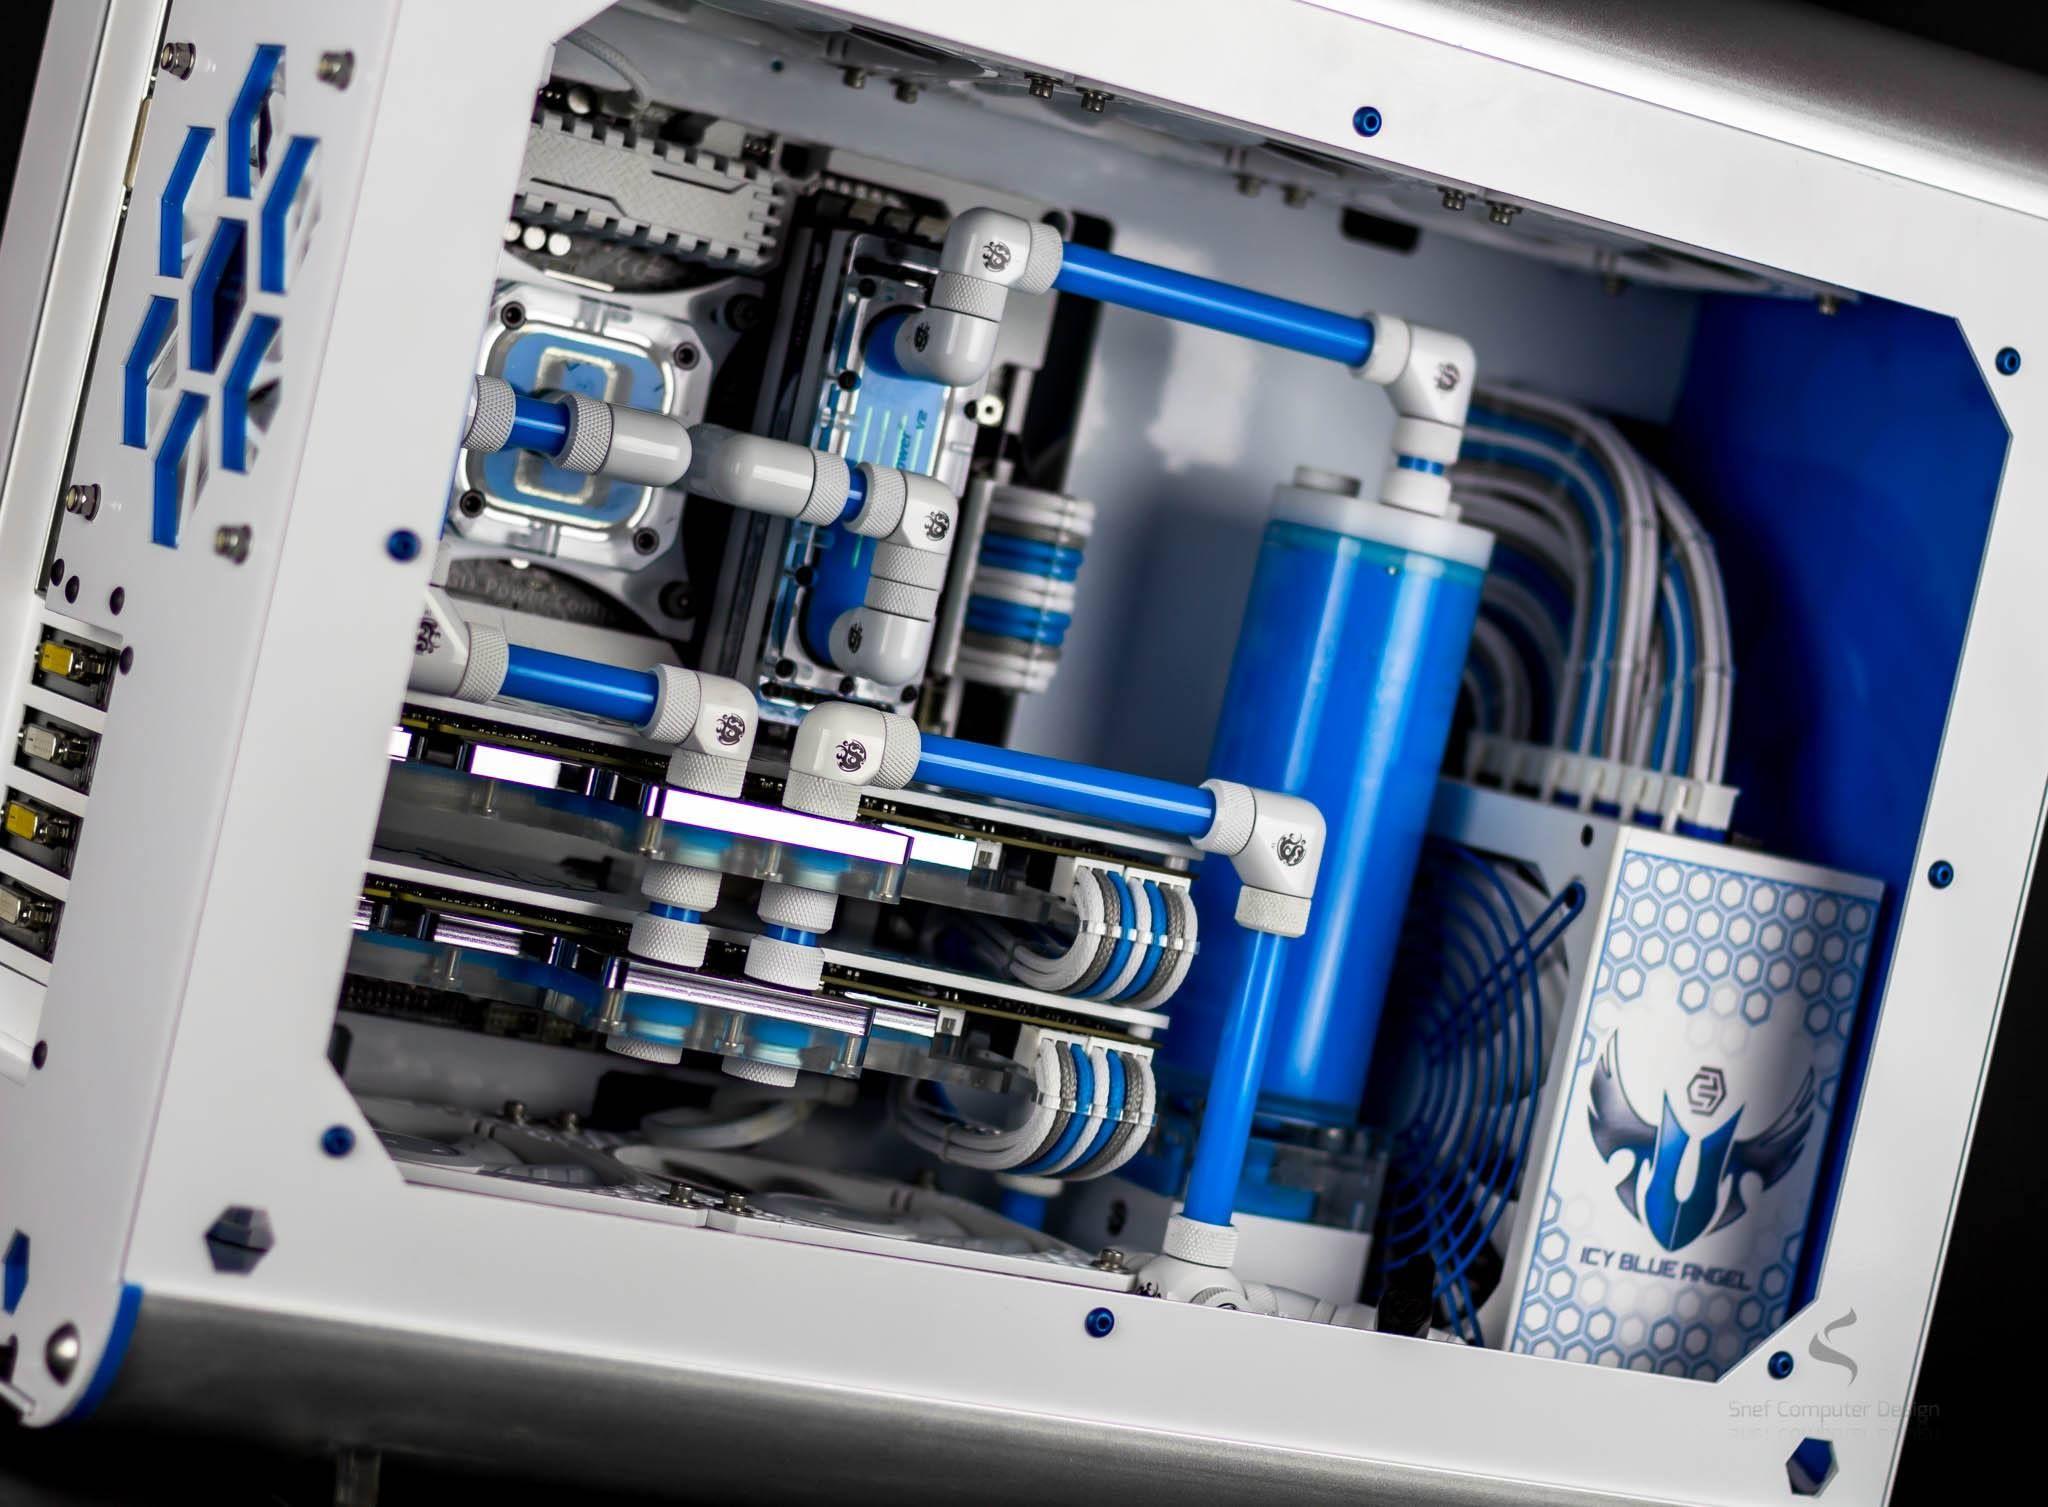 Find Best Parts To Build Pc